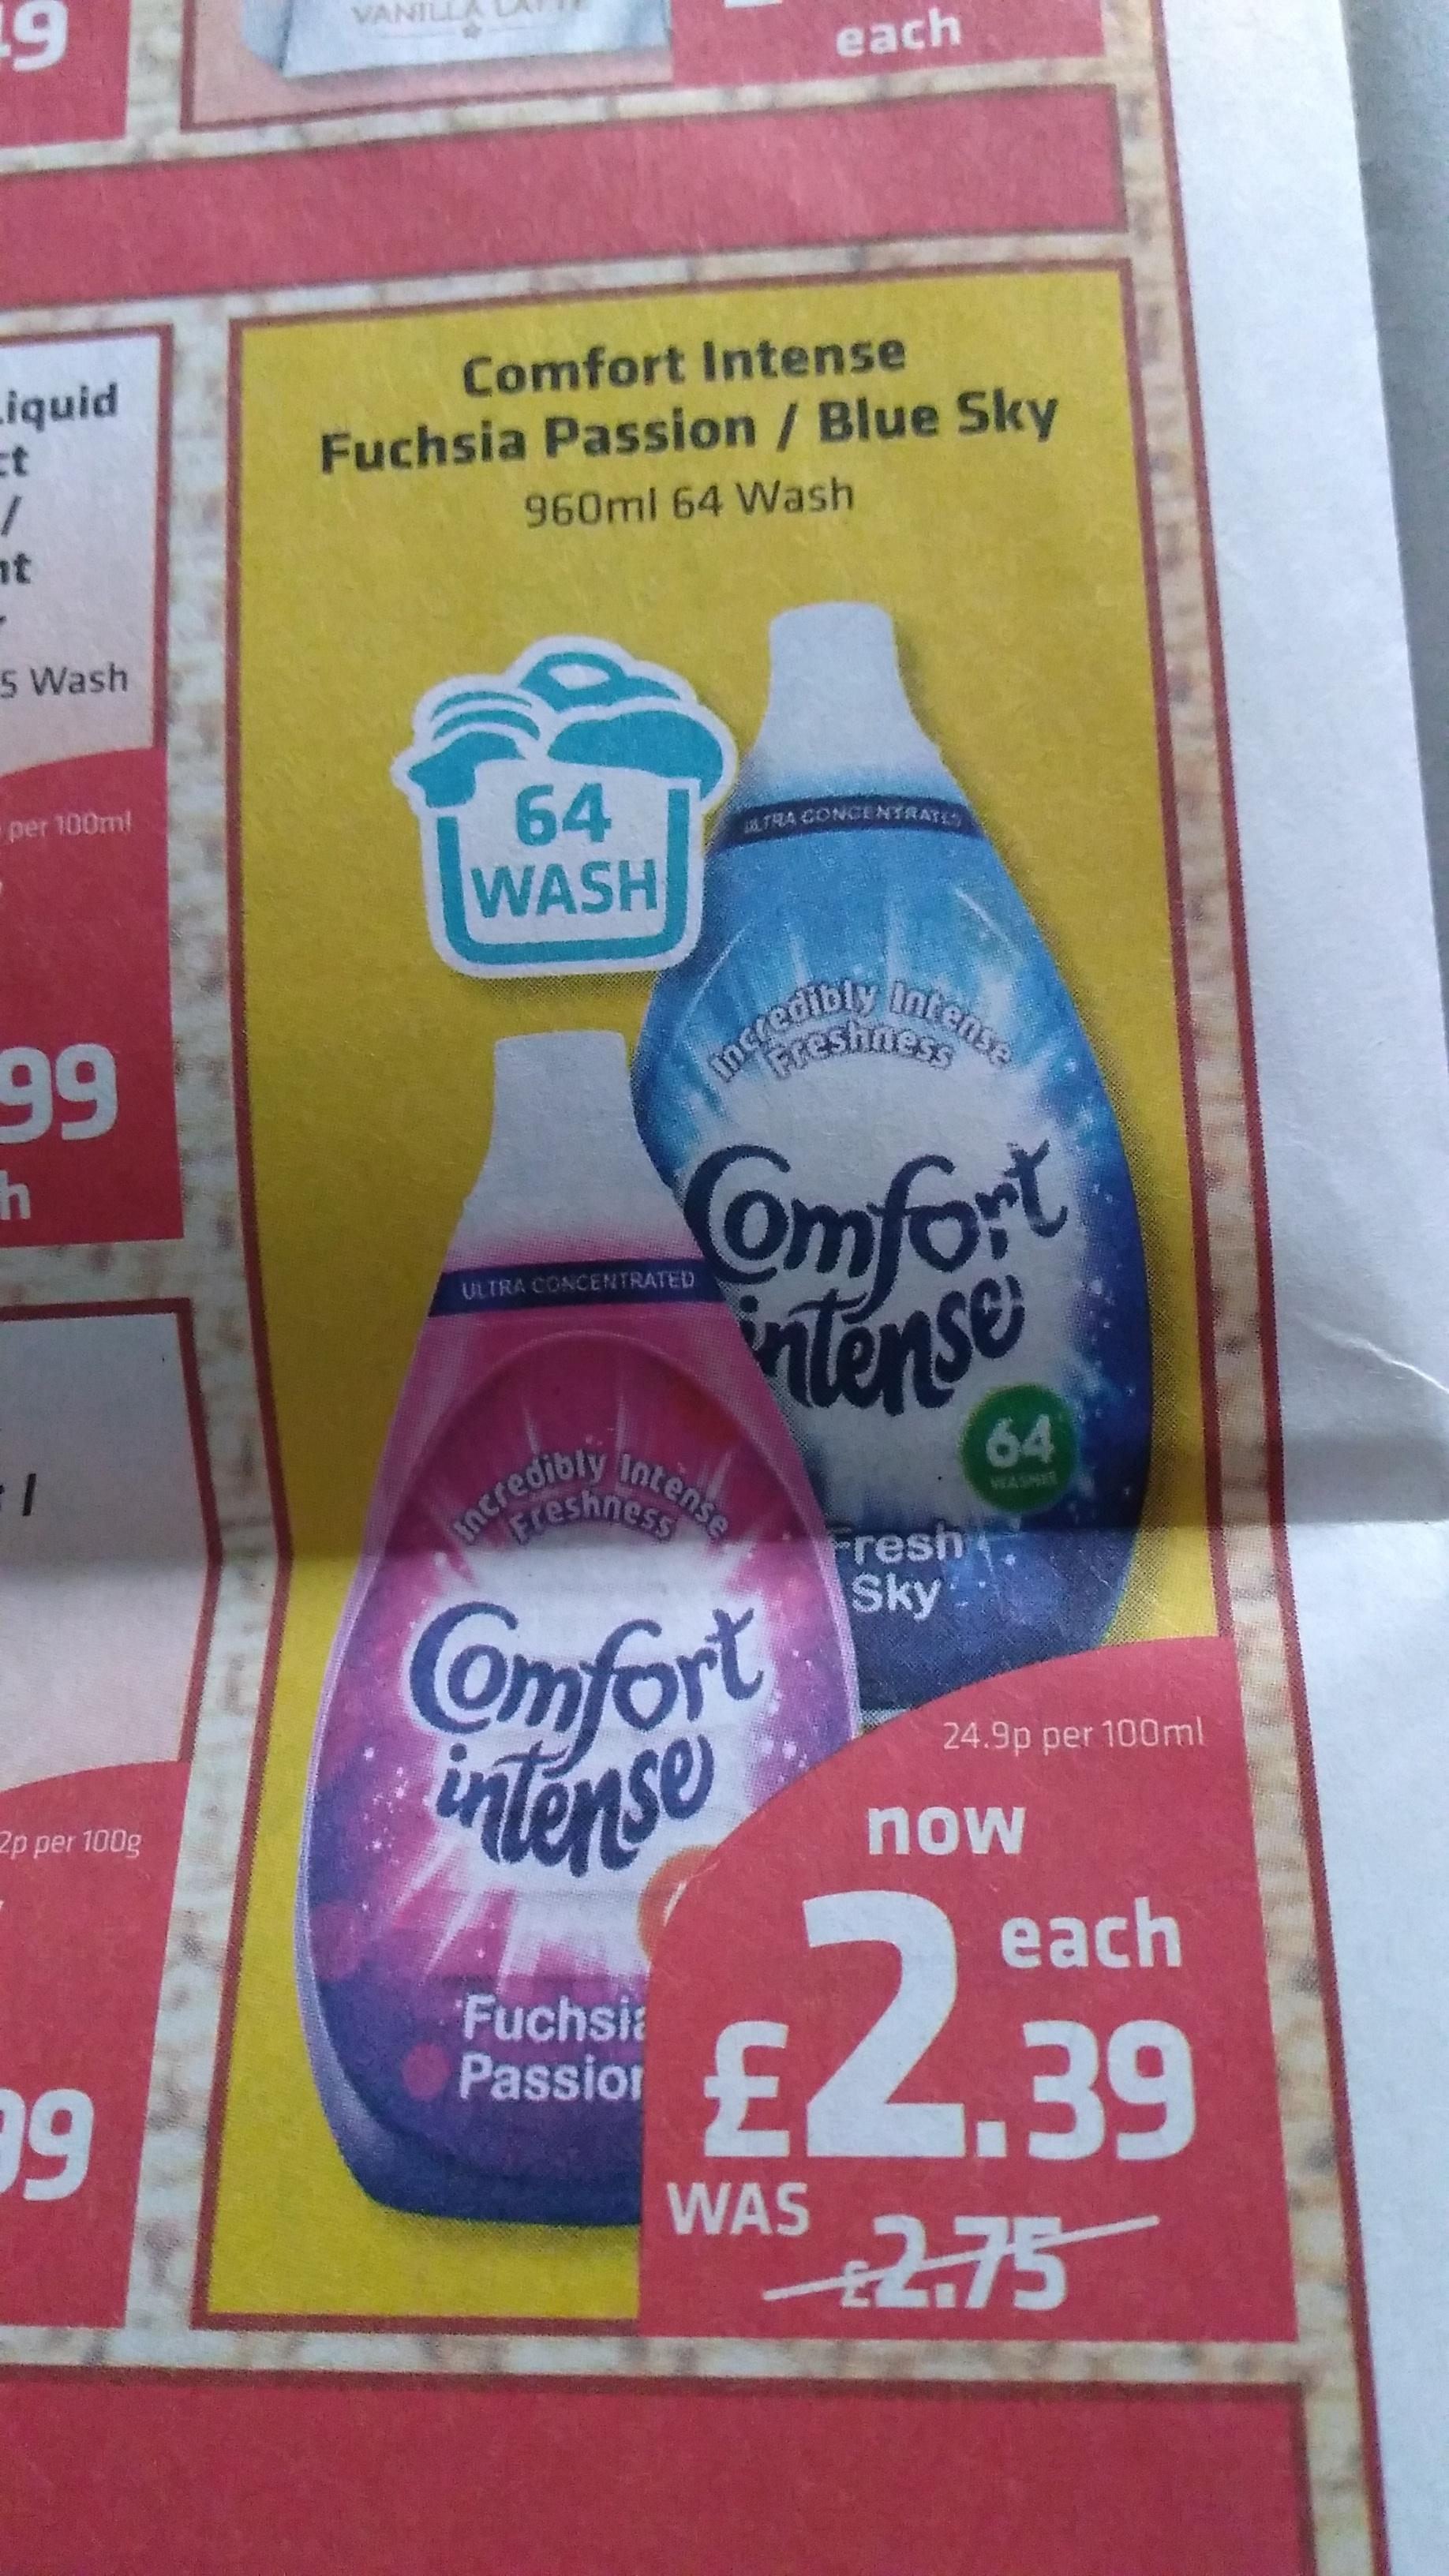 Comfort Intense Fushsia Passion/Blue Sky  64 Wash £2.39 at Savers